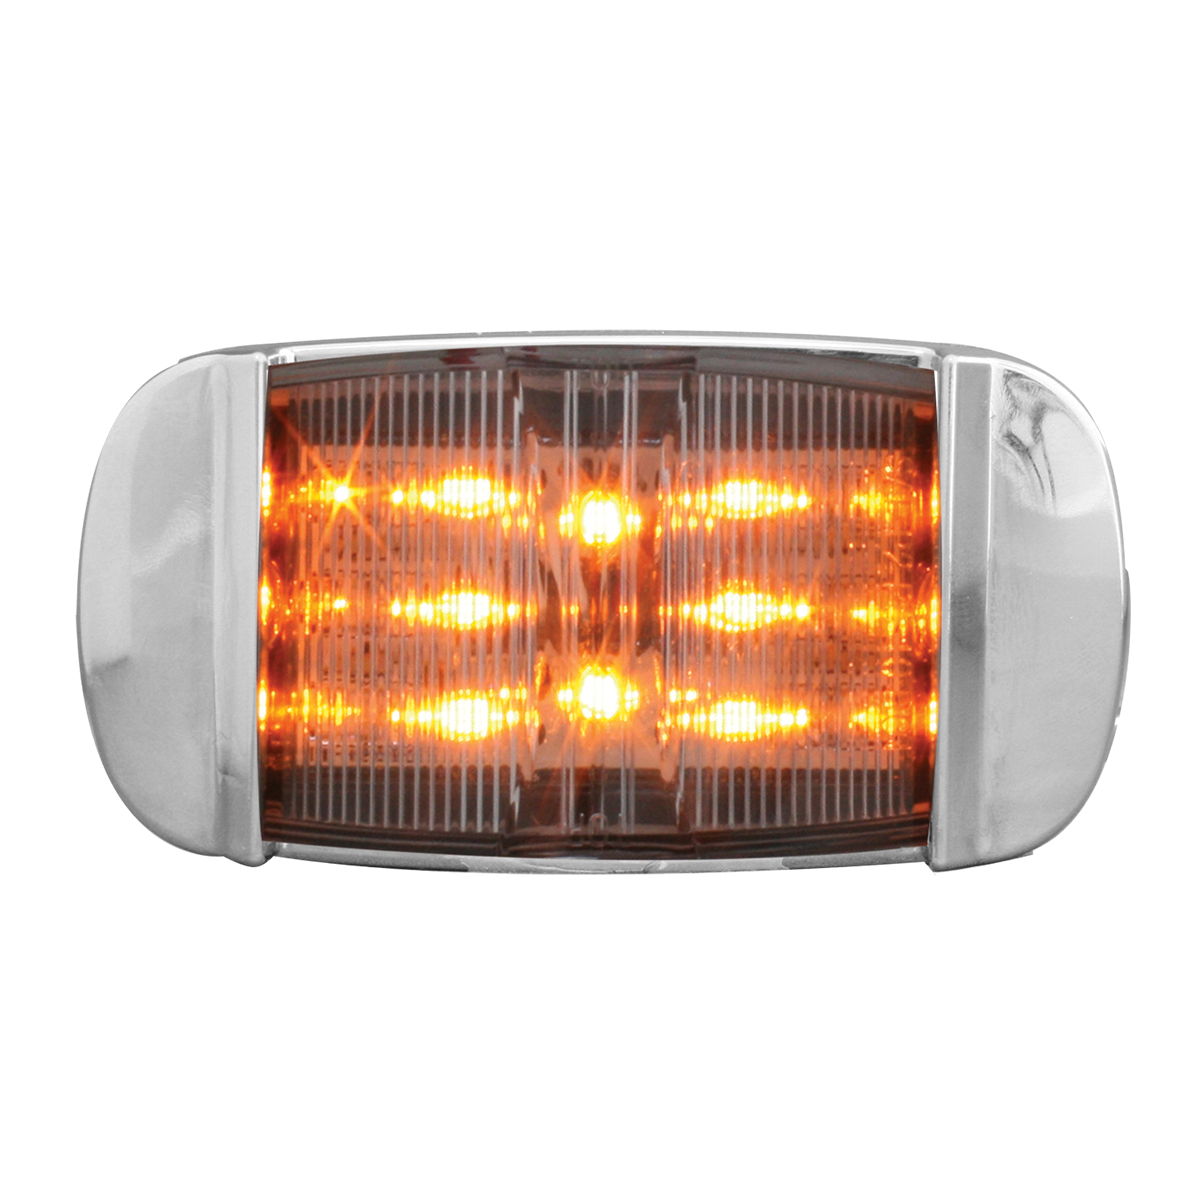 76255 Rectangular Camel Back Wide Angle LED Marker Light w/ Chrome Bezel